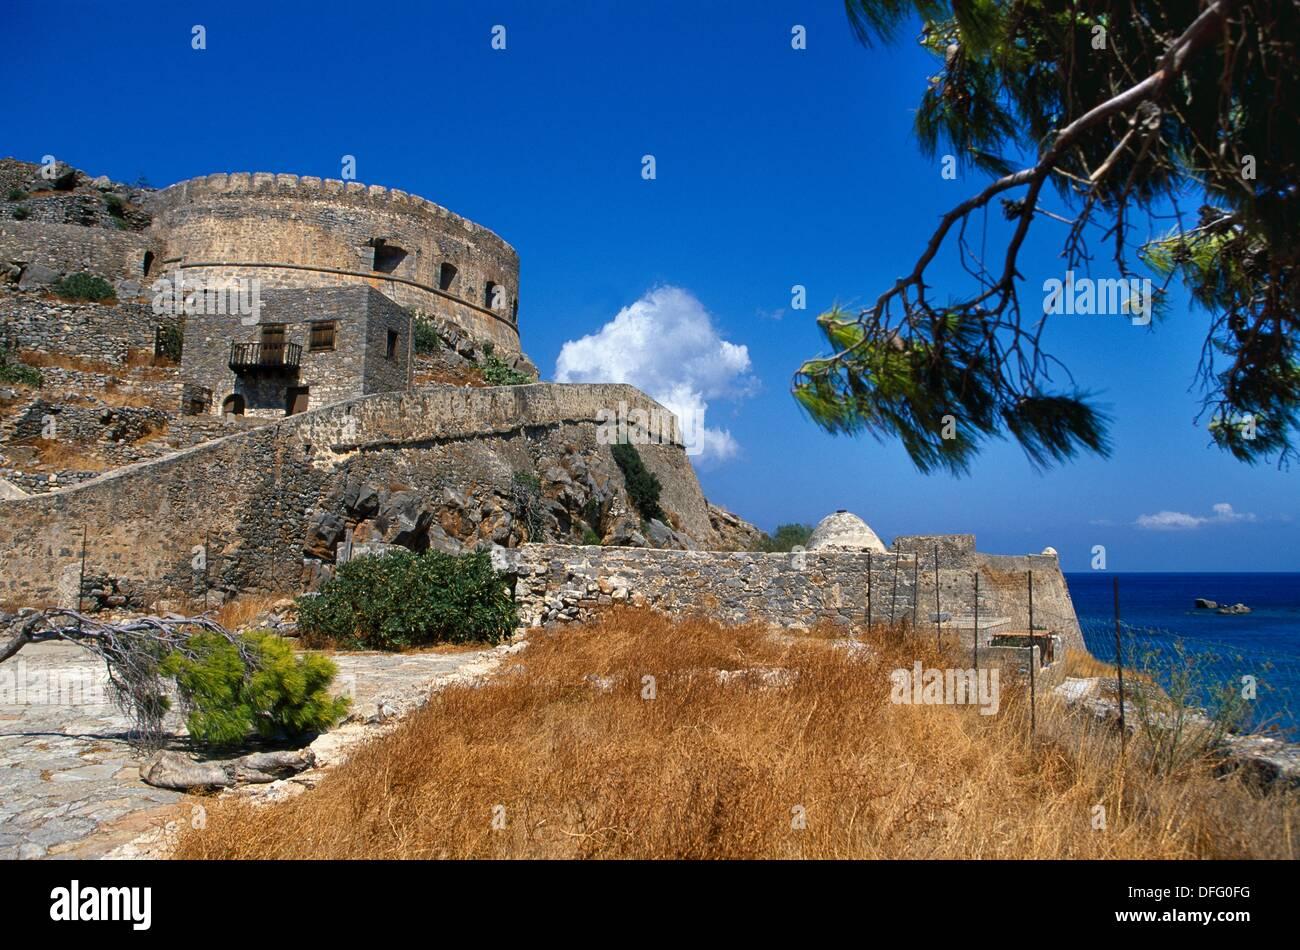 16th Century Venetian Fortress  Spinalonga Island  Gulf of Mirambello, Crete  Greece. - Stock Image